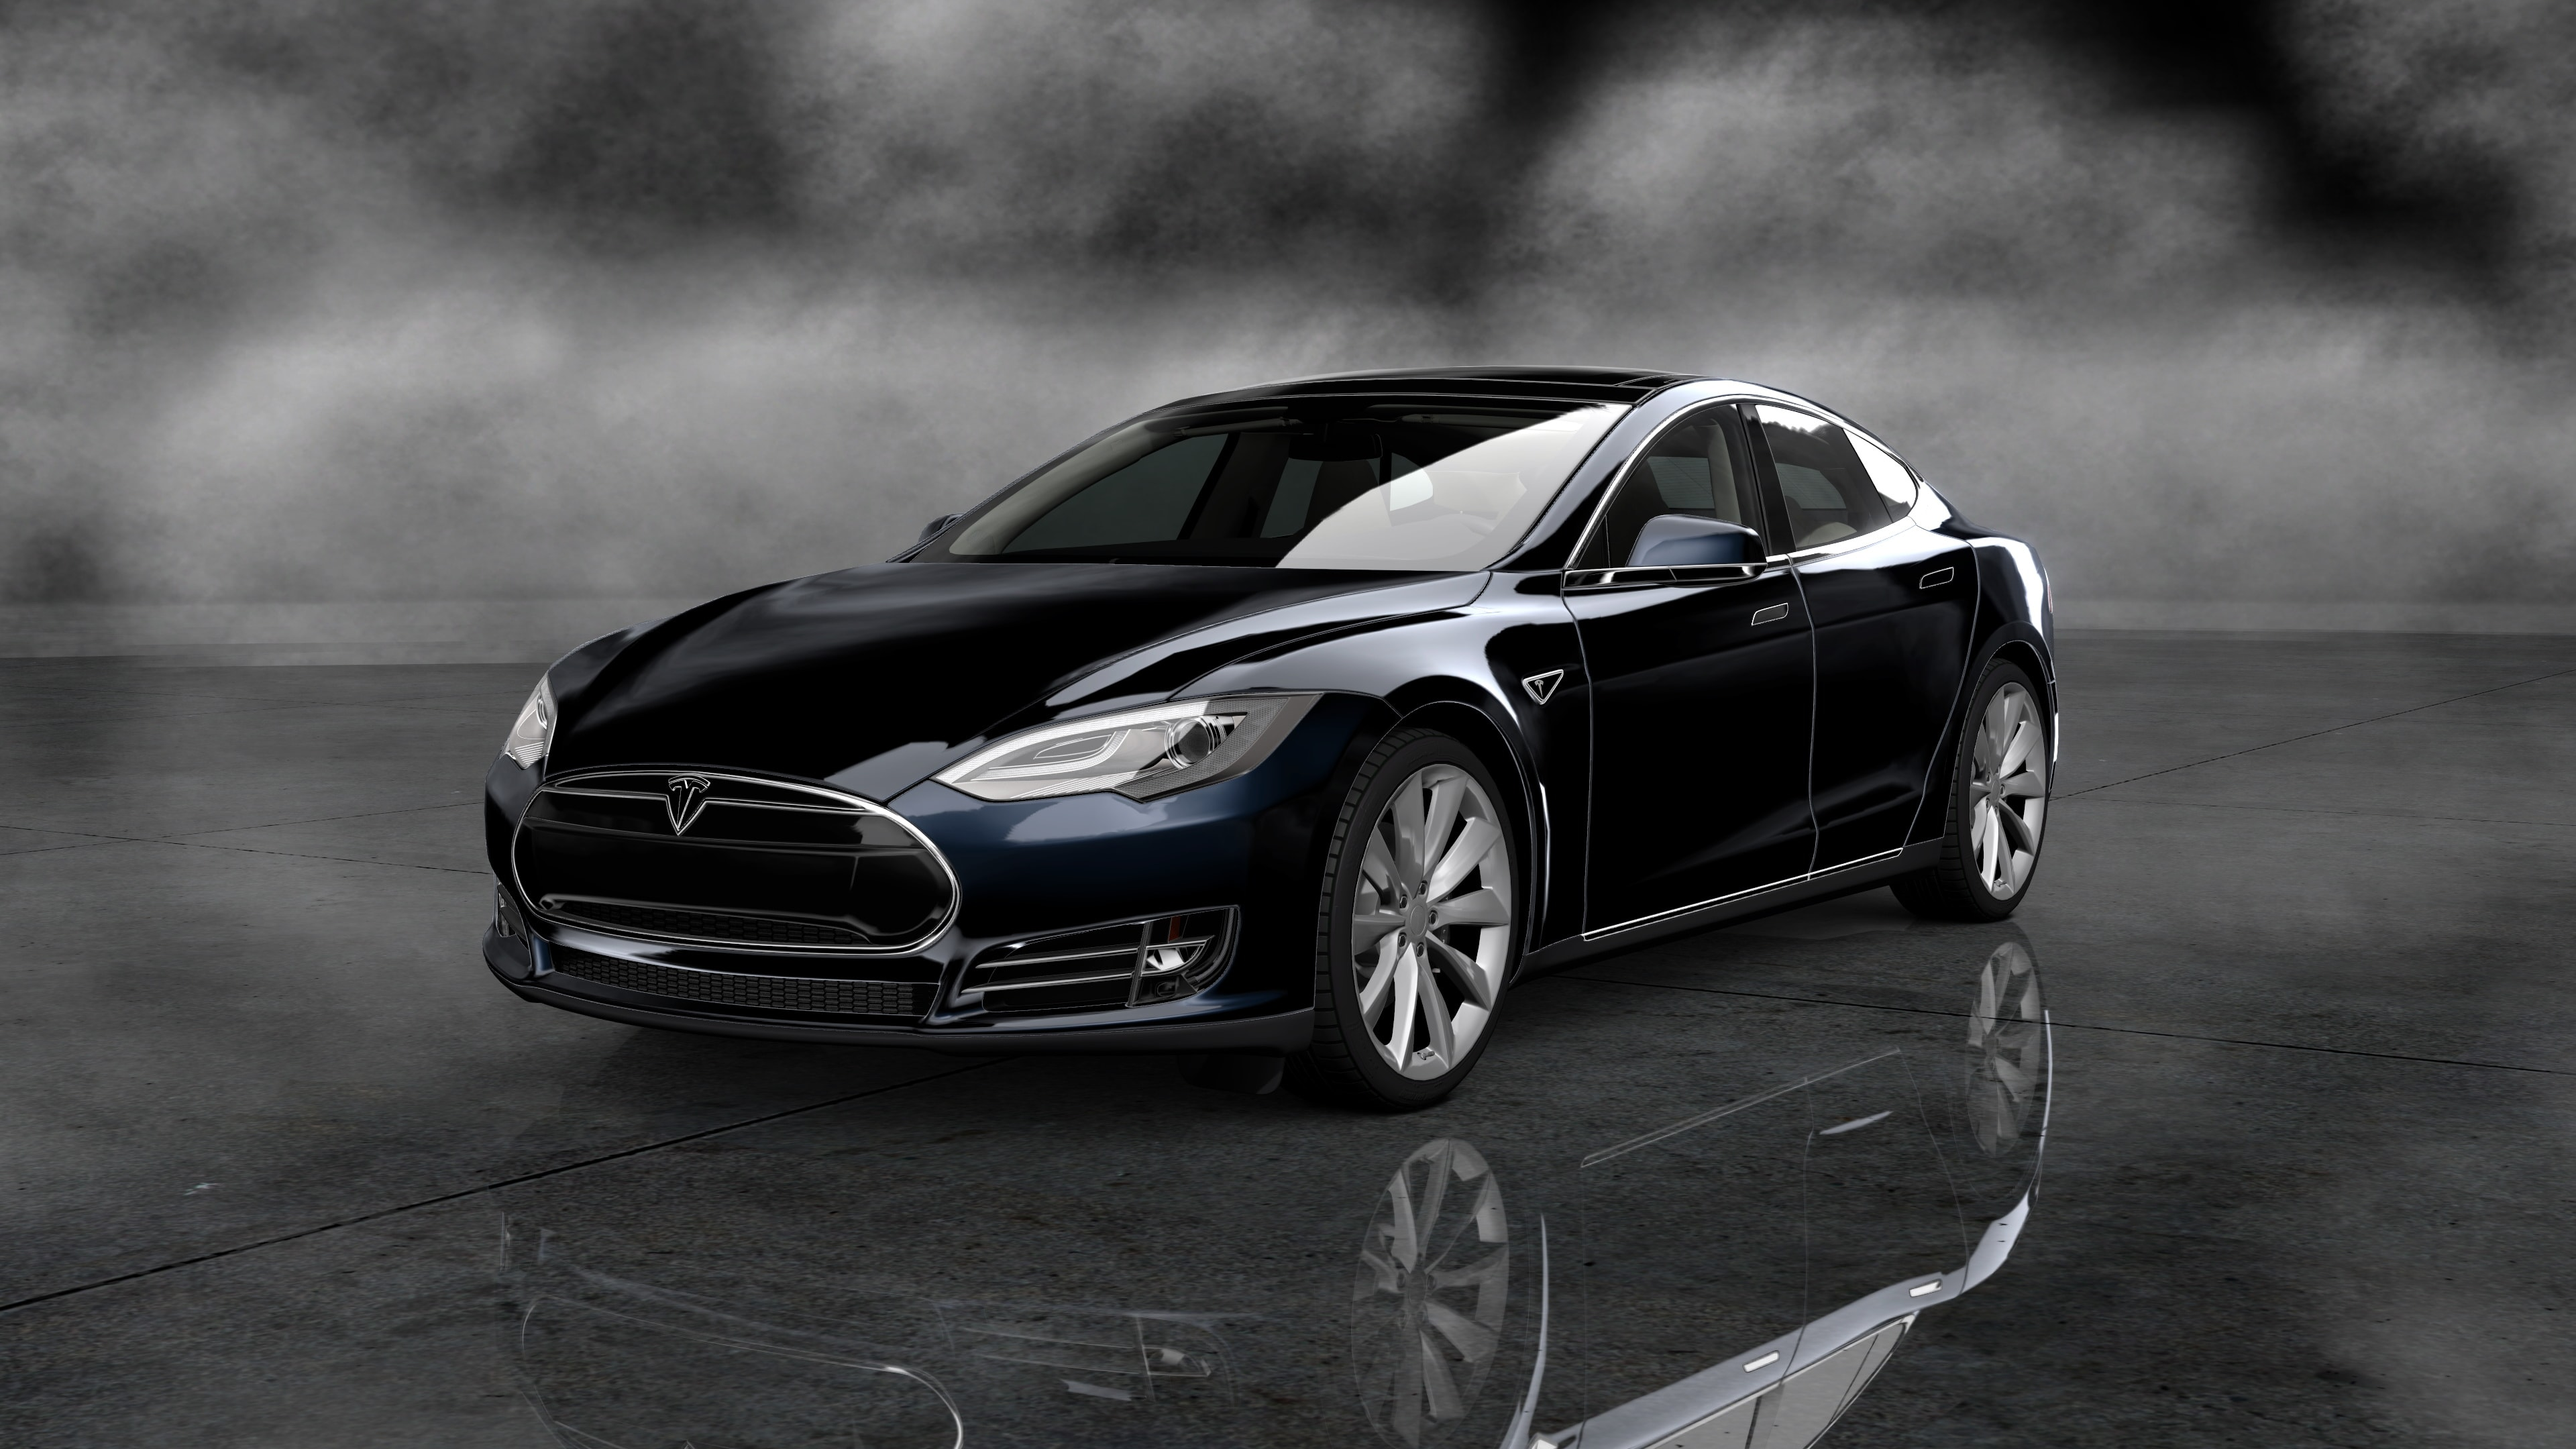 Tesla Model S Wallpapers hd